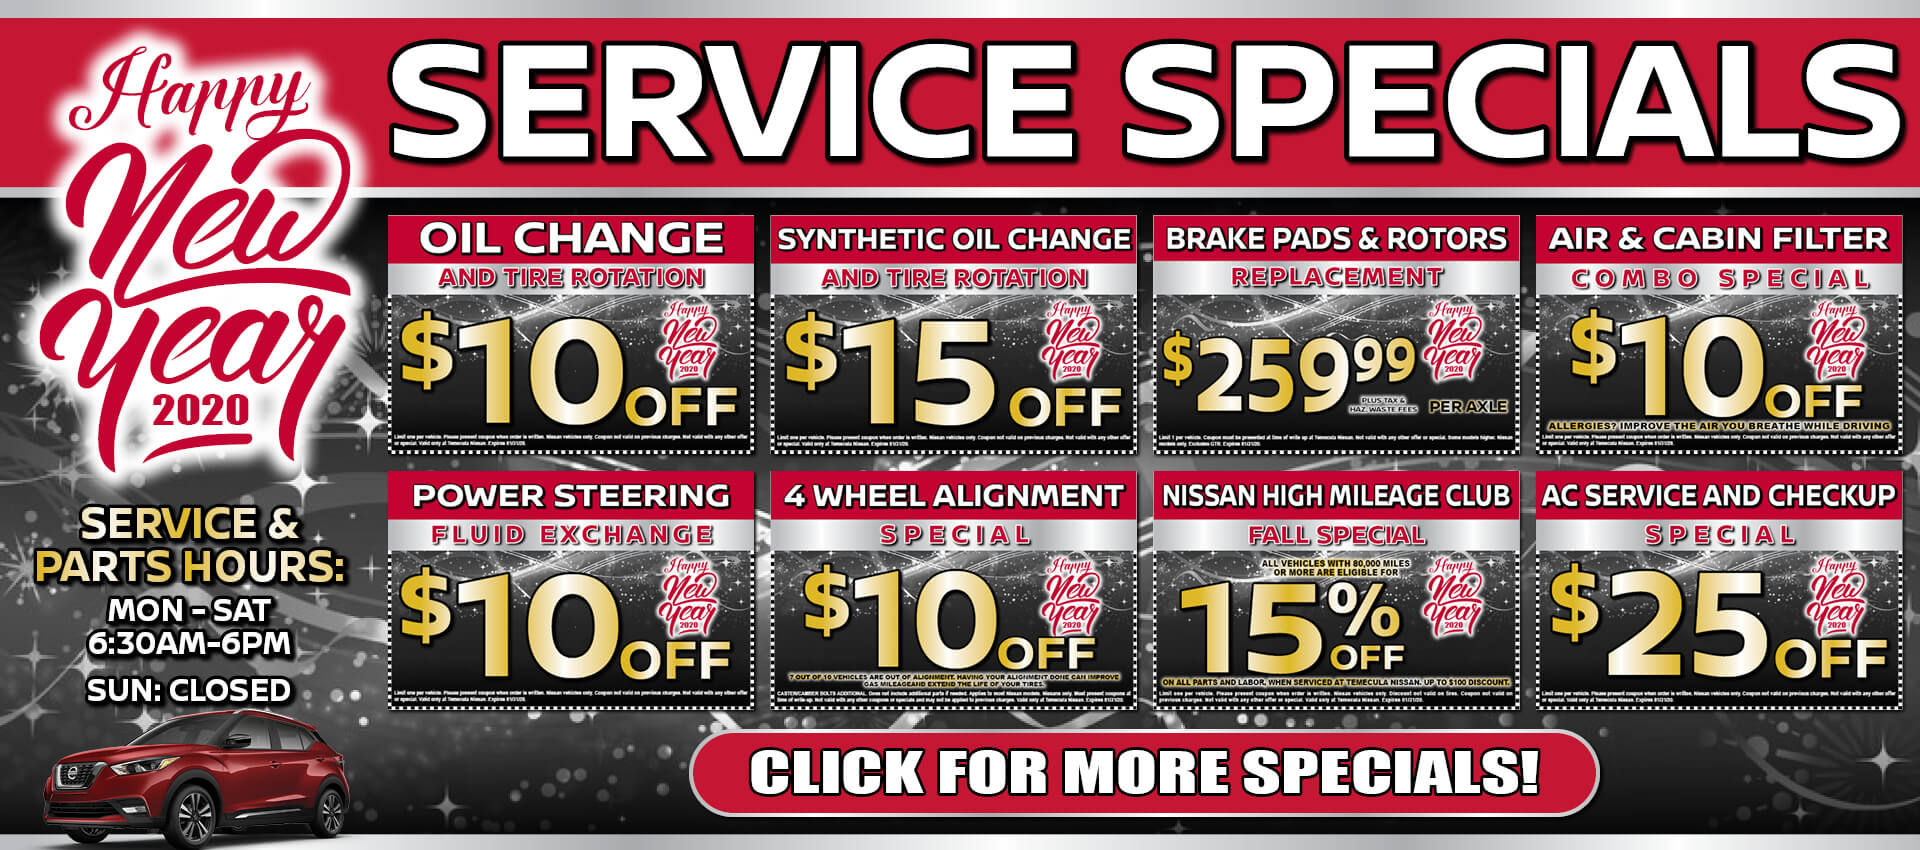 Service Specials Jan 2020